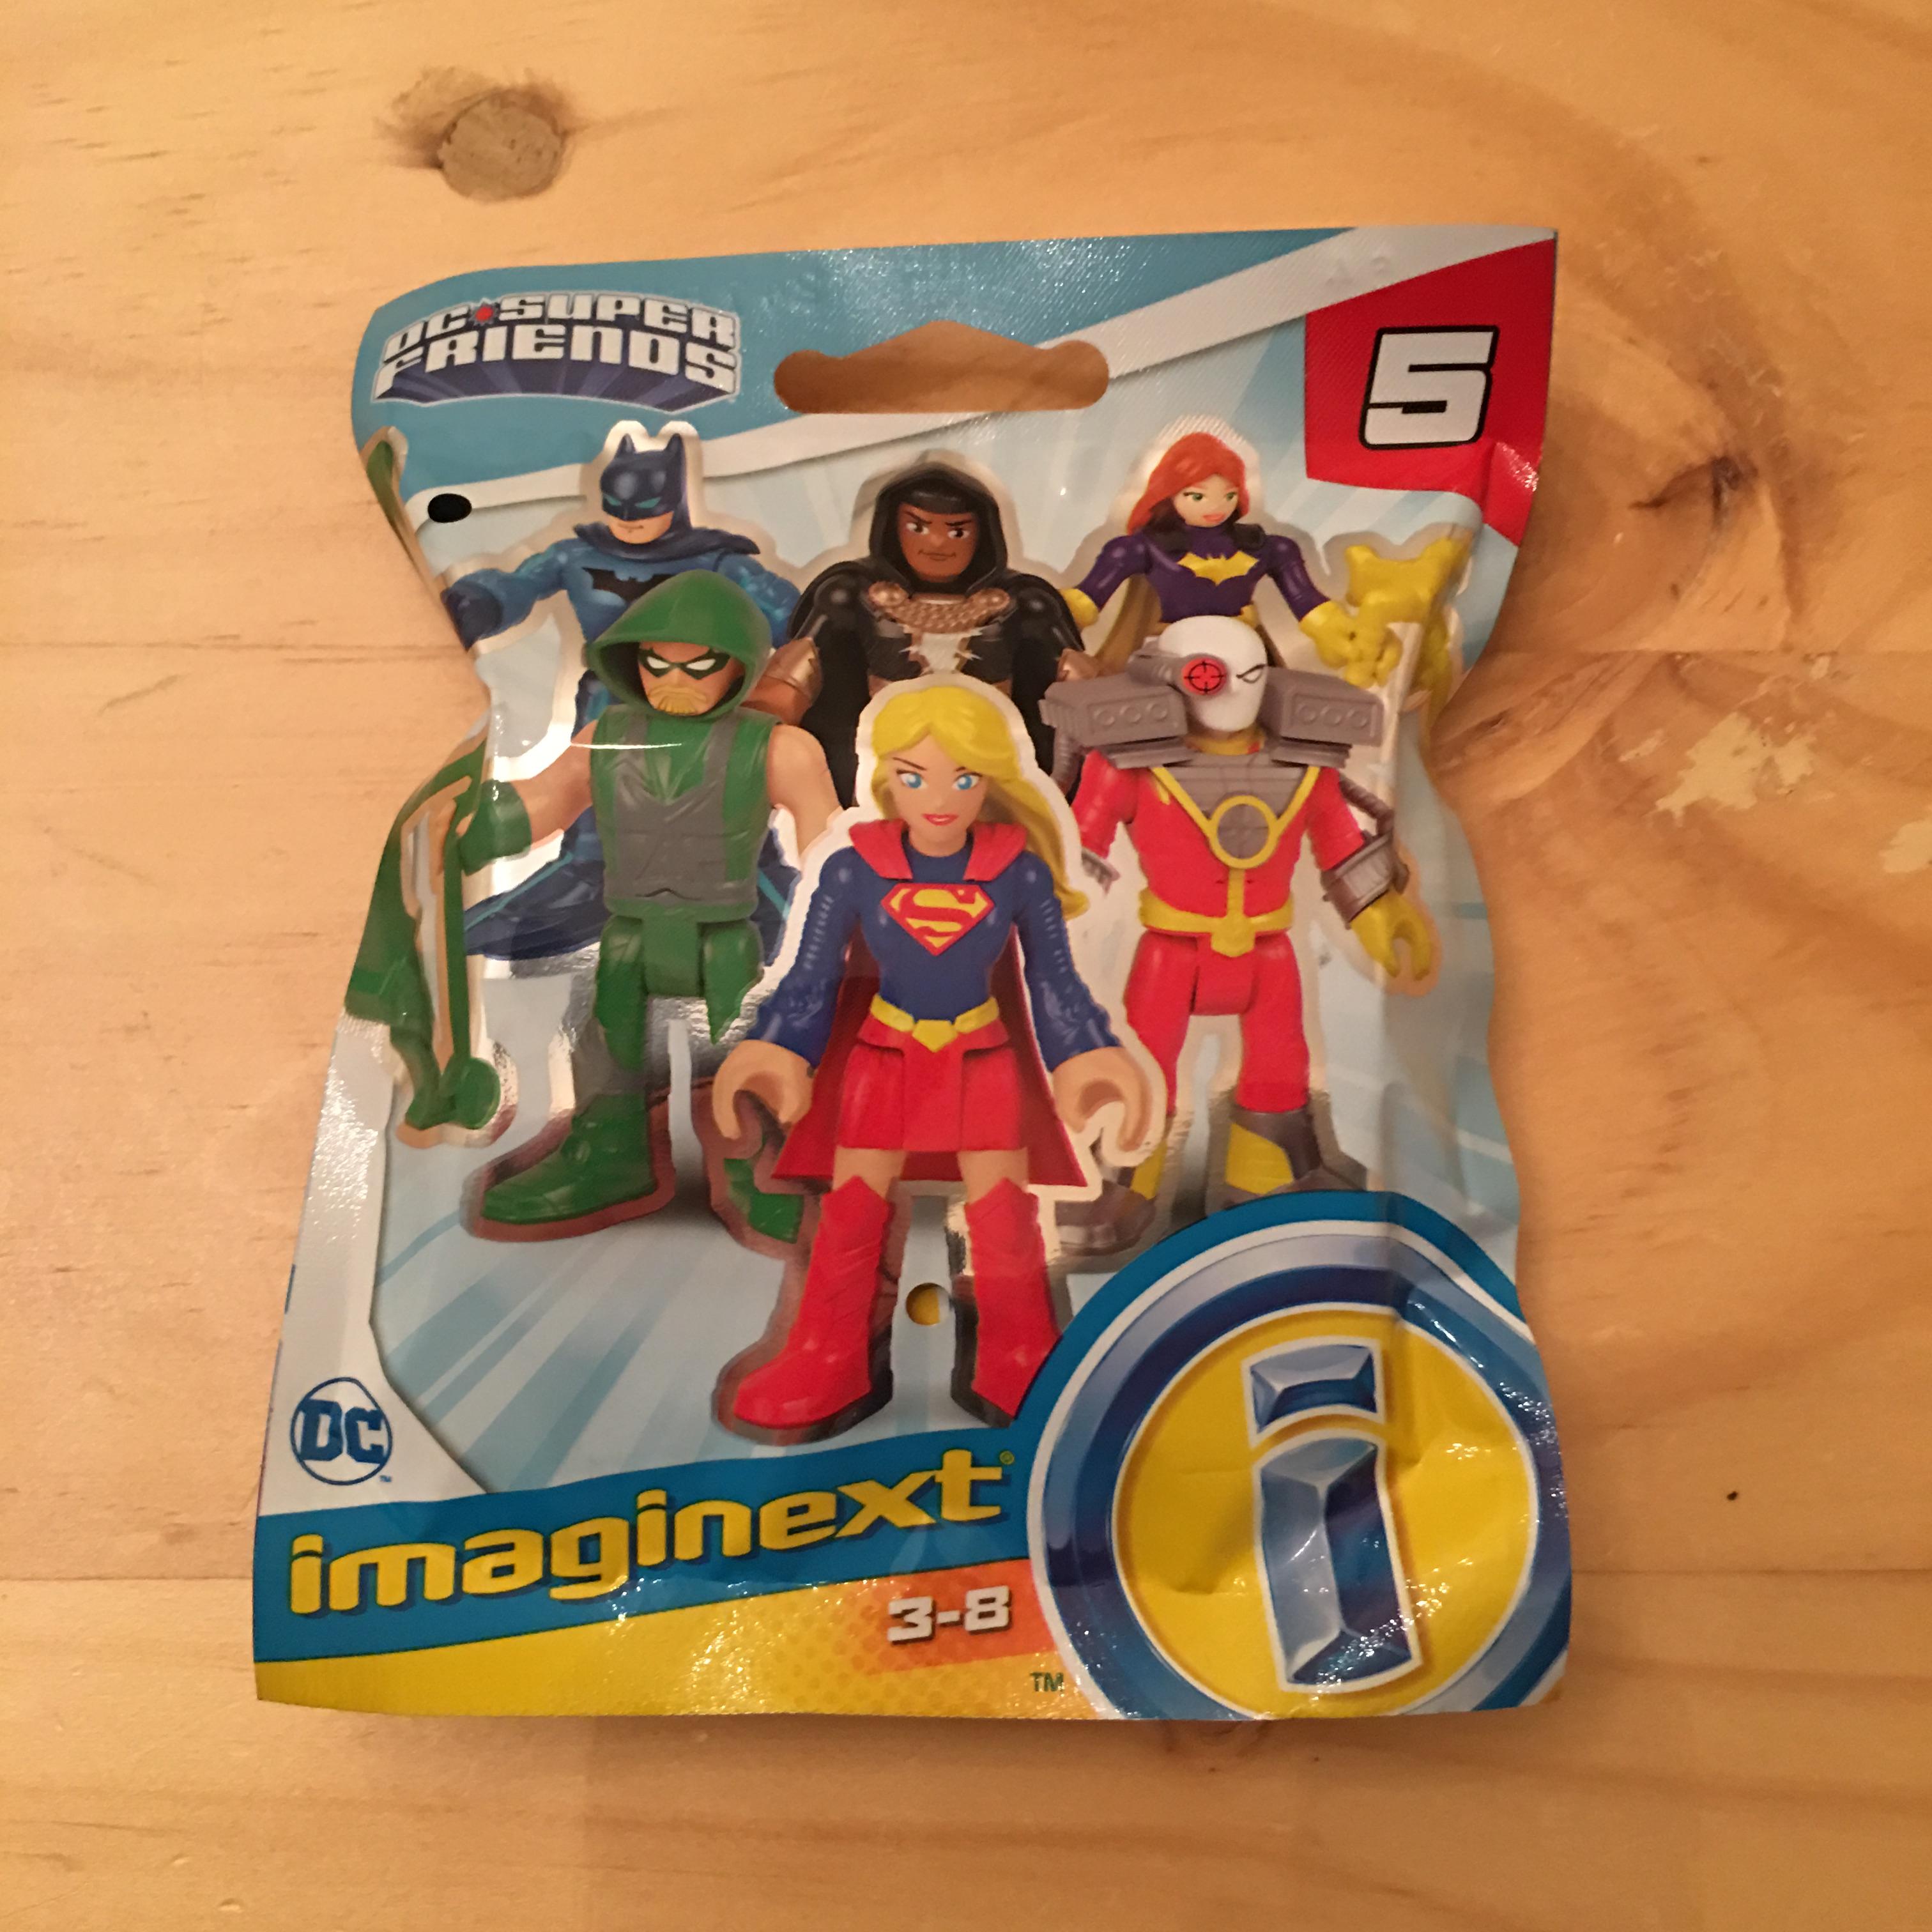 Imaginext DC Super Friends Series 5 Blindbags instore at Tesco for £2.25